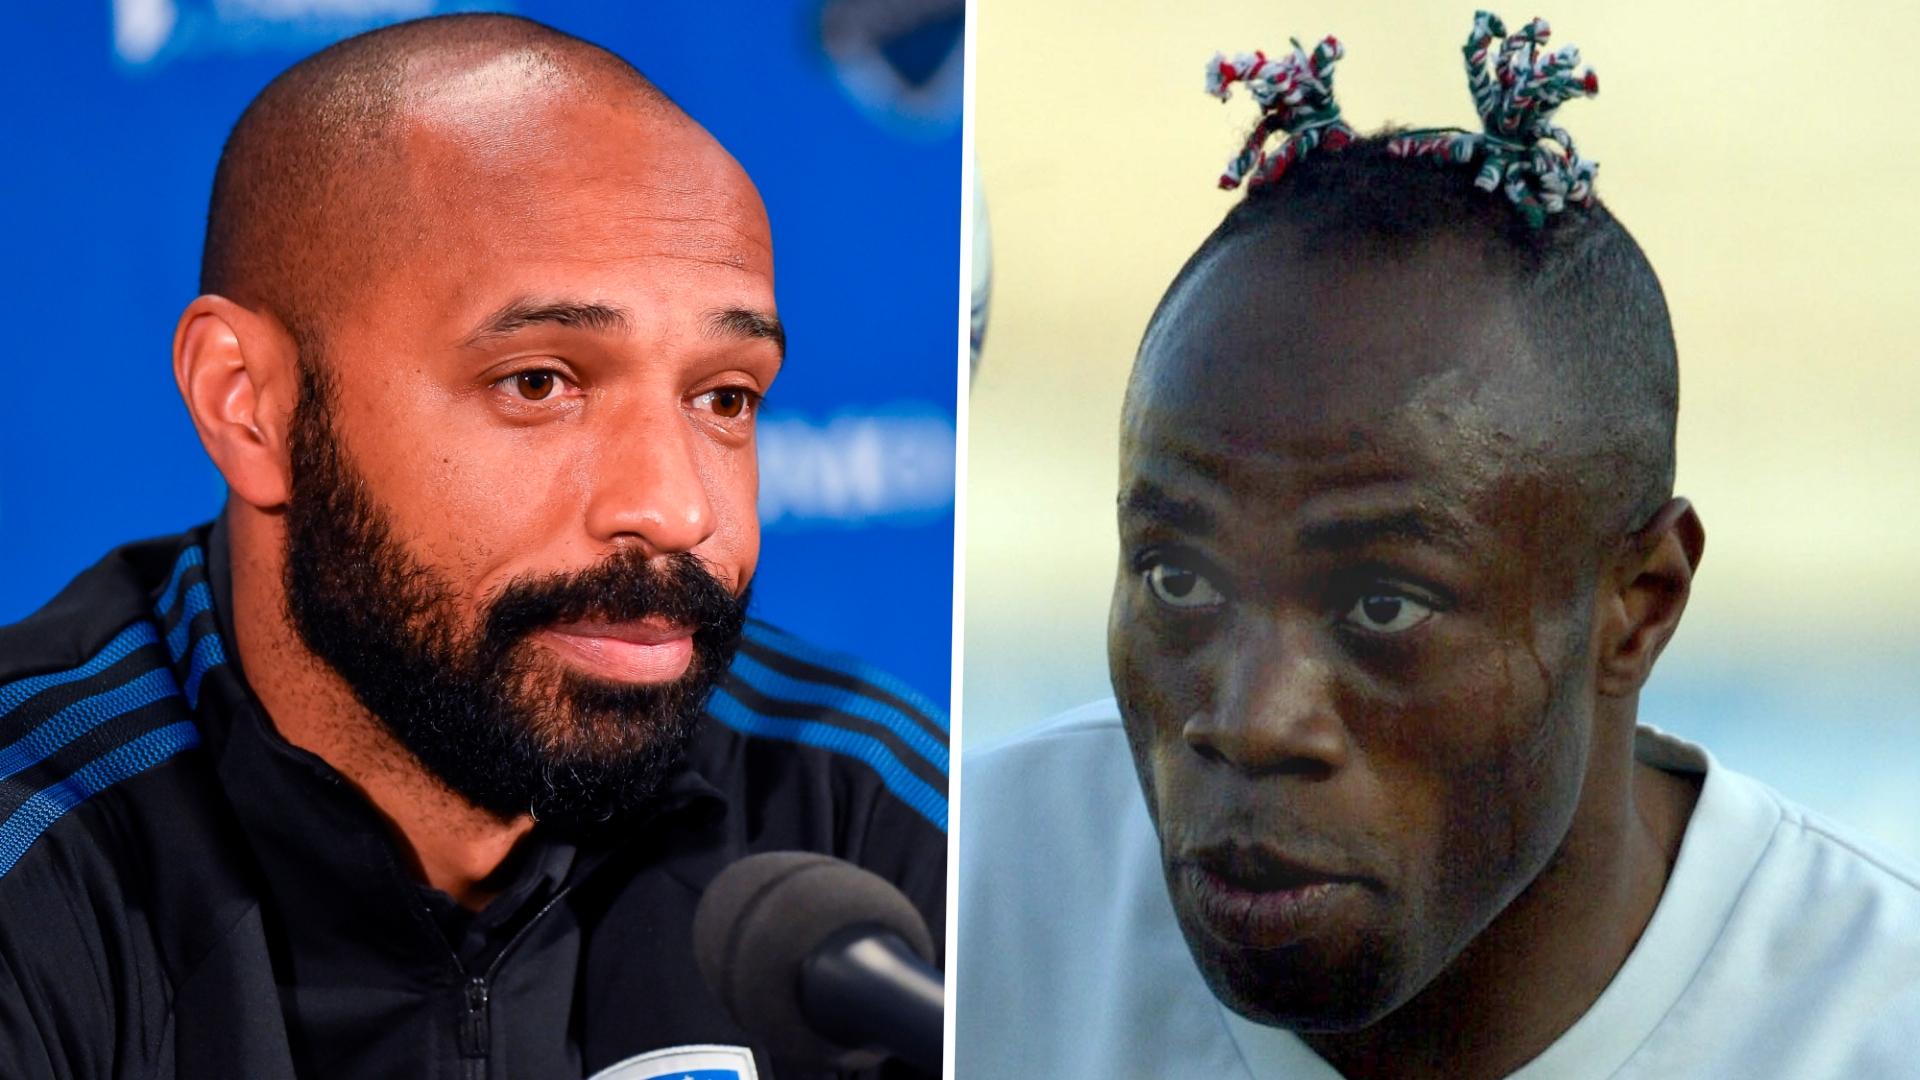 Taribo West: Arsenal legend Henry picks Nigerian as toughest opponent of his career